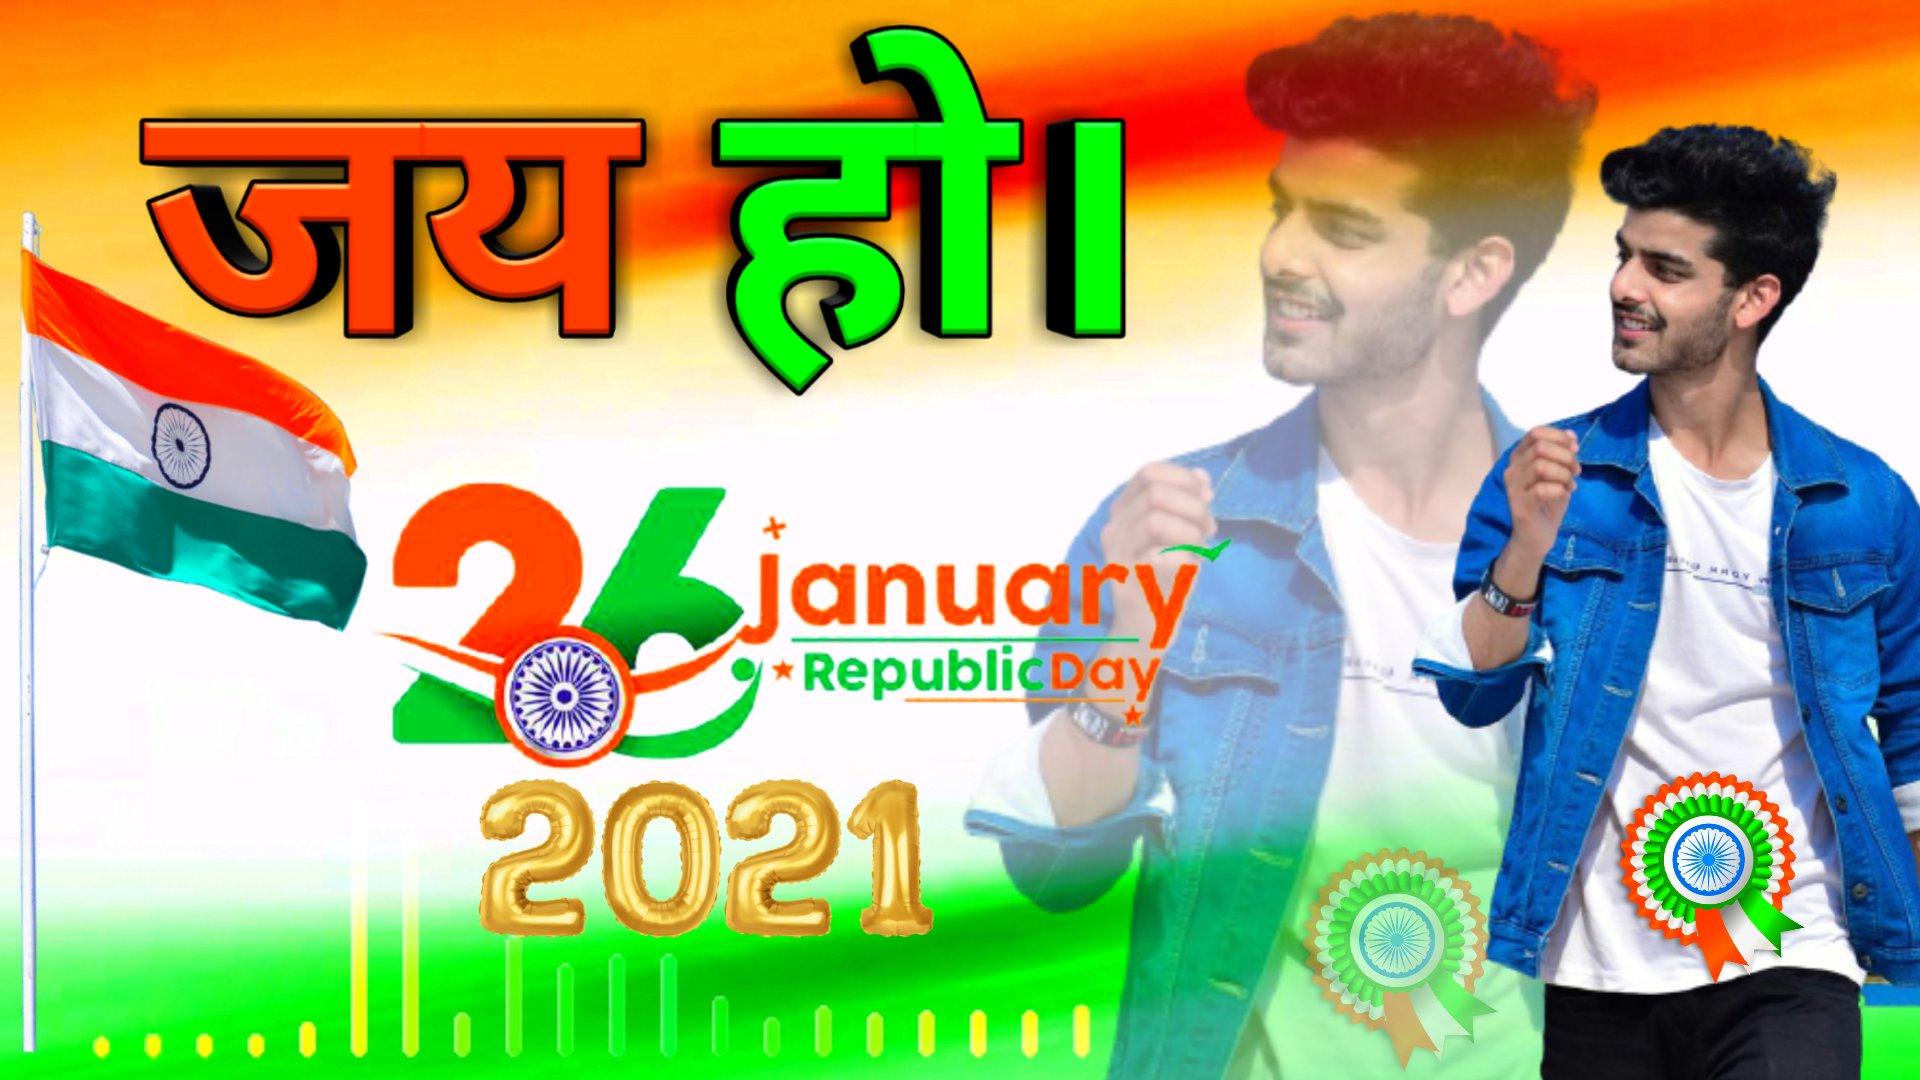 Republic Day Special Whatsapp Status Video Editing In Kinemaster 2021 - Finetech Raju